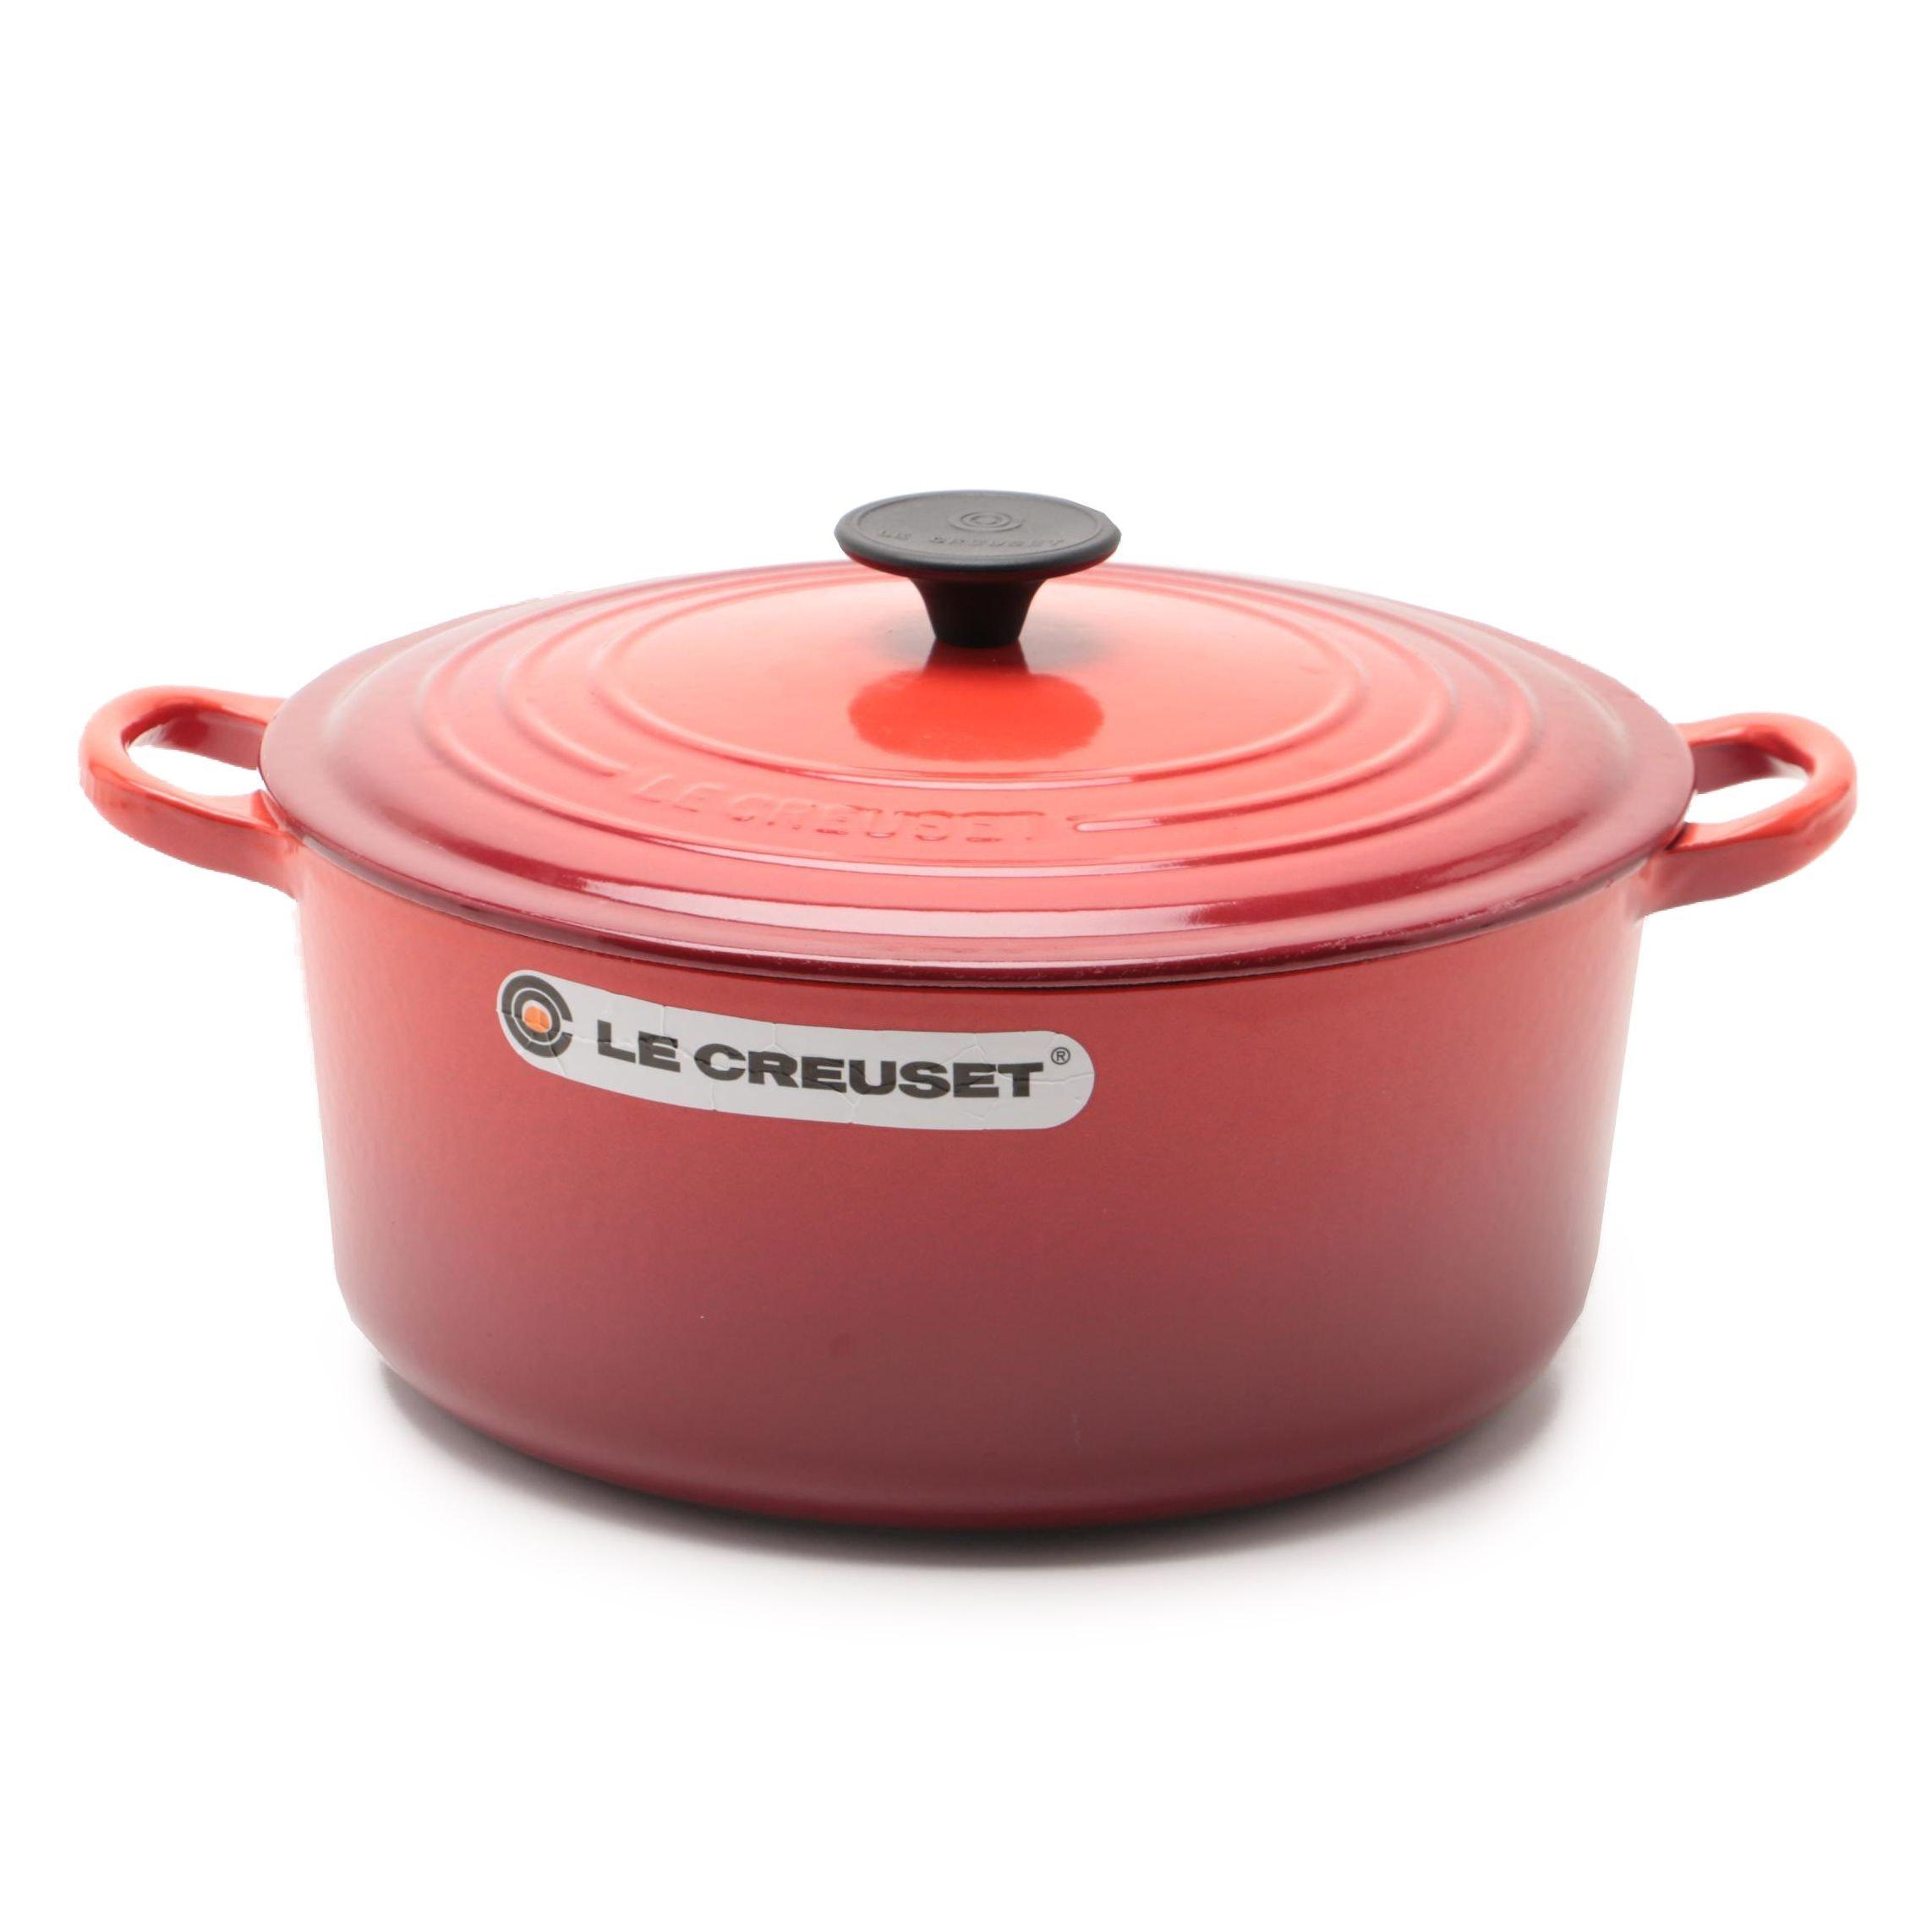 Le Creuset Red Enameled Cast Iron Dutch Oven